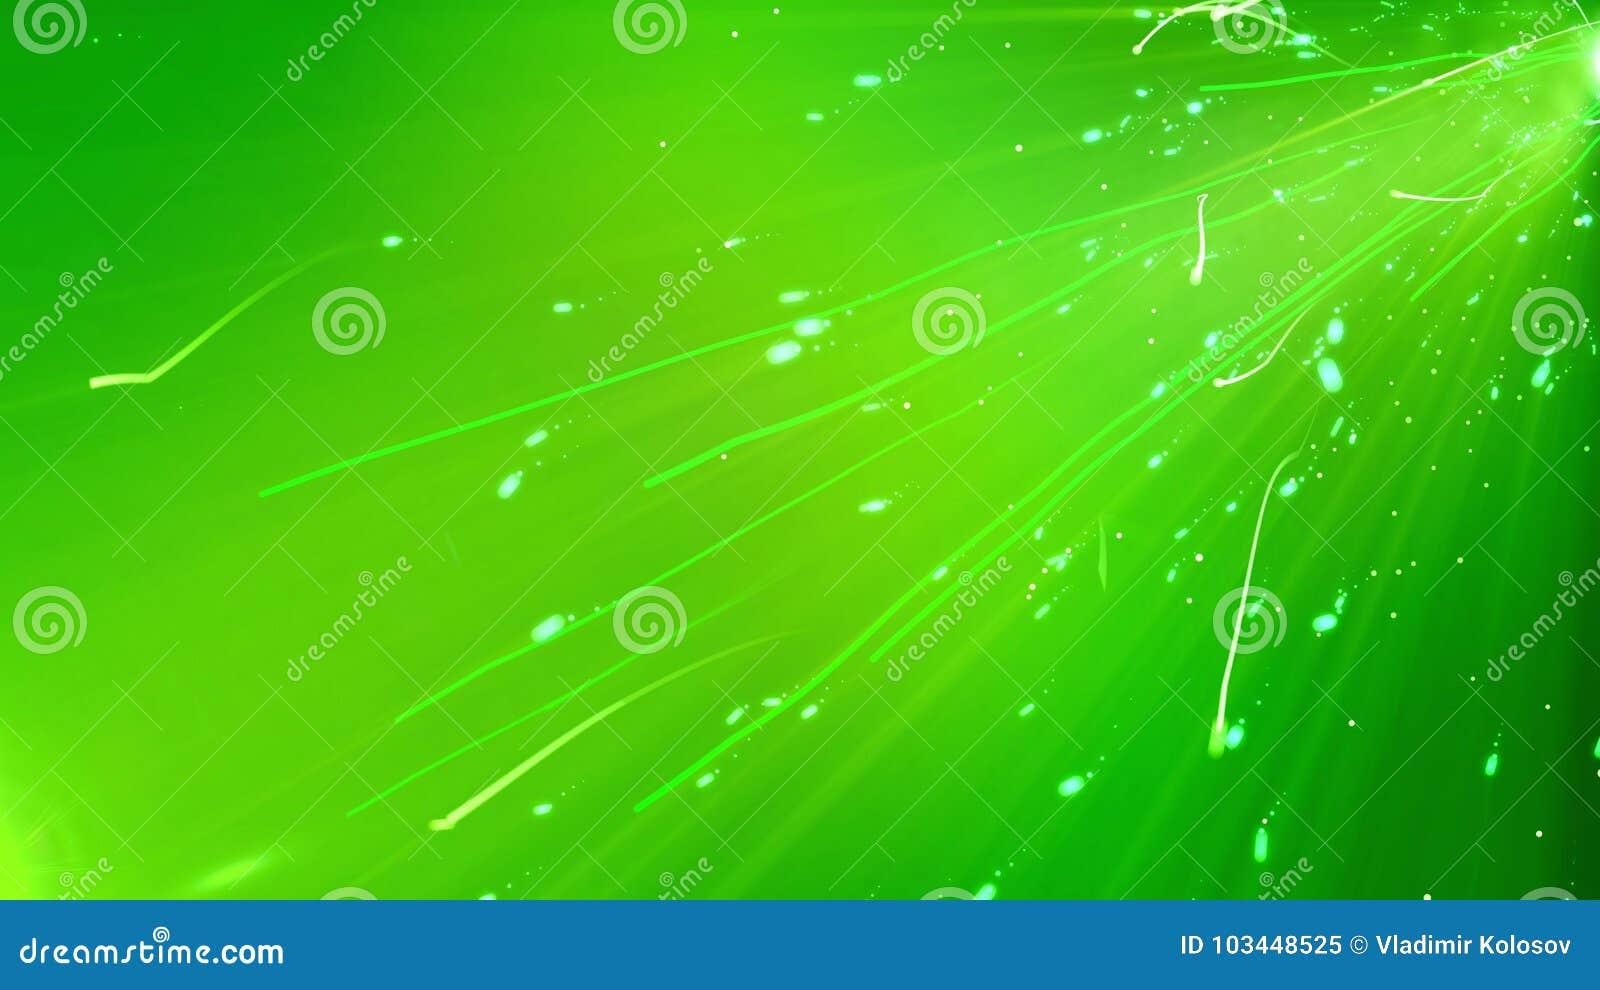 Glazing Green Curvy Lines